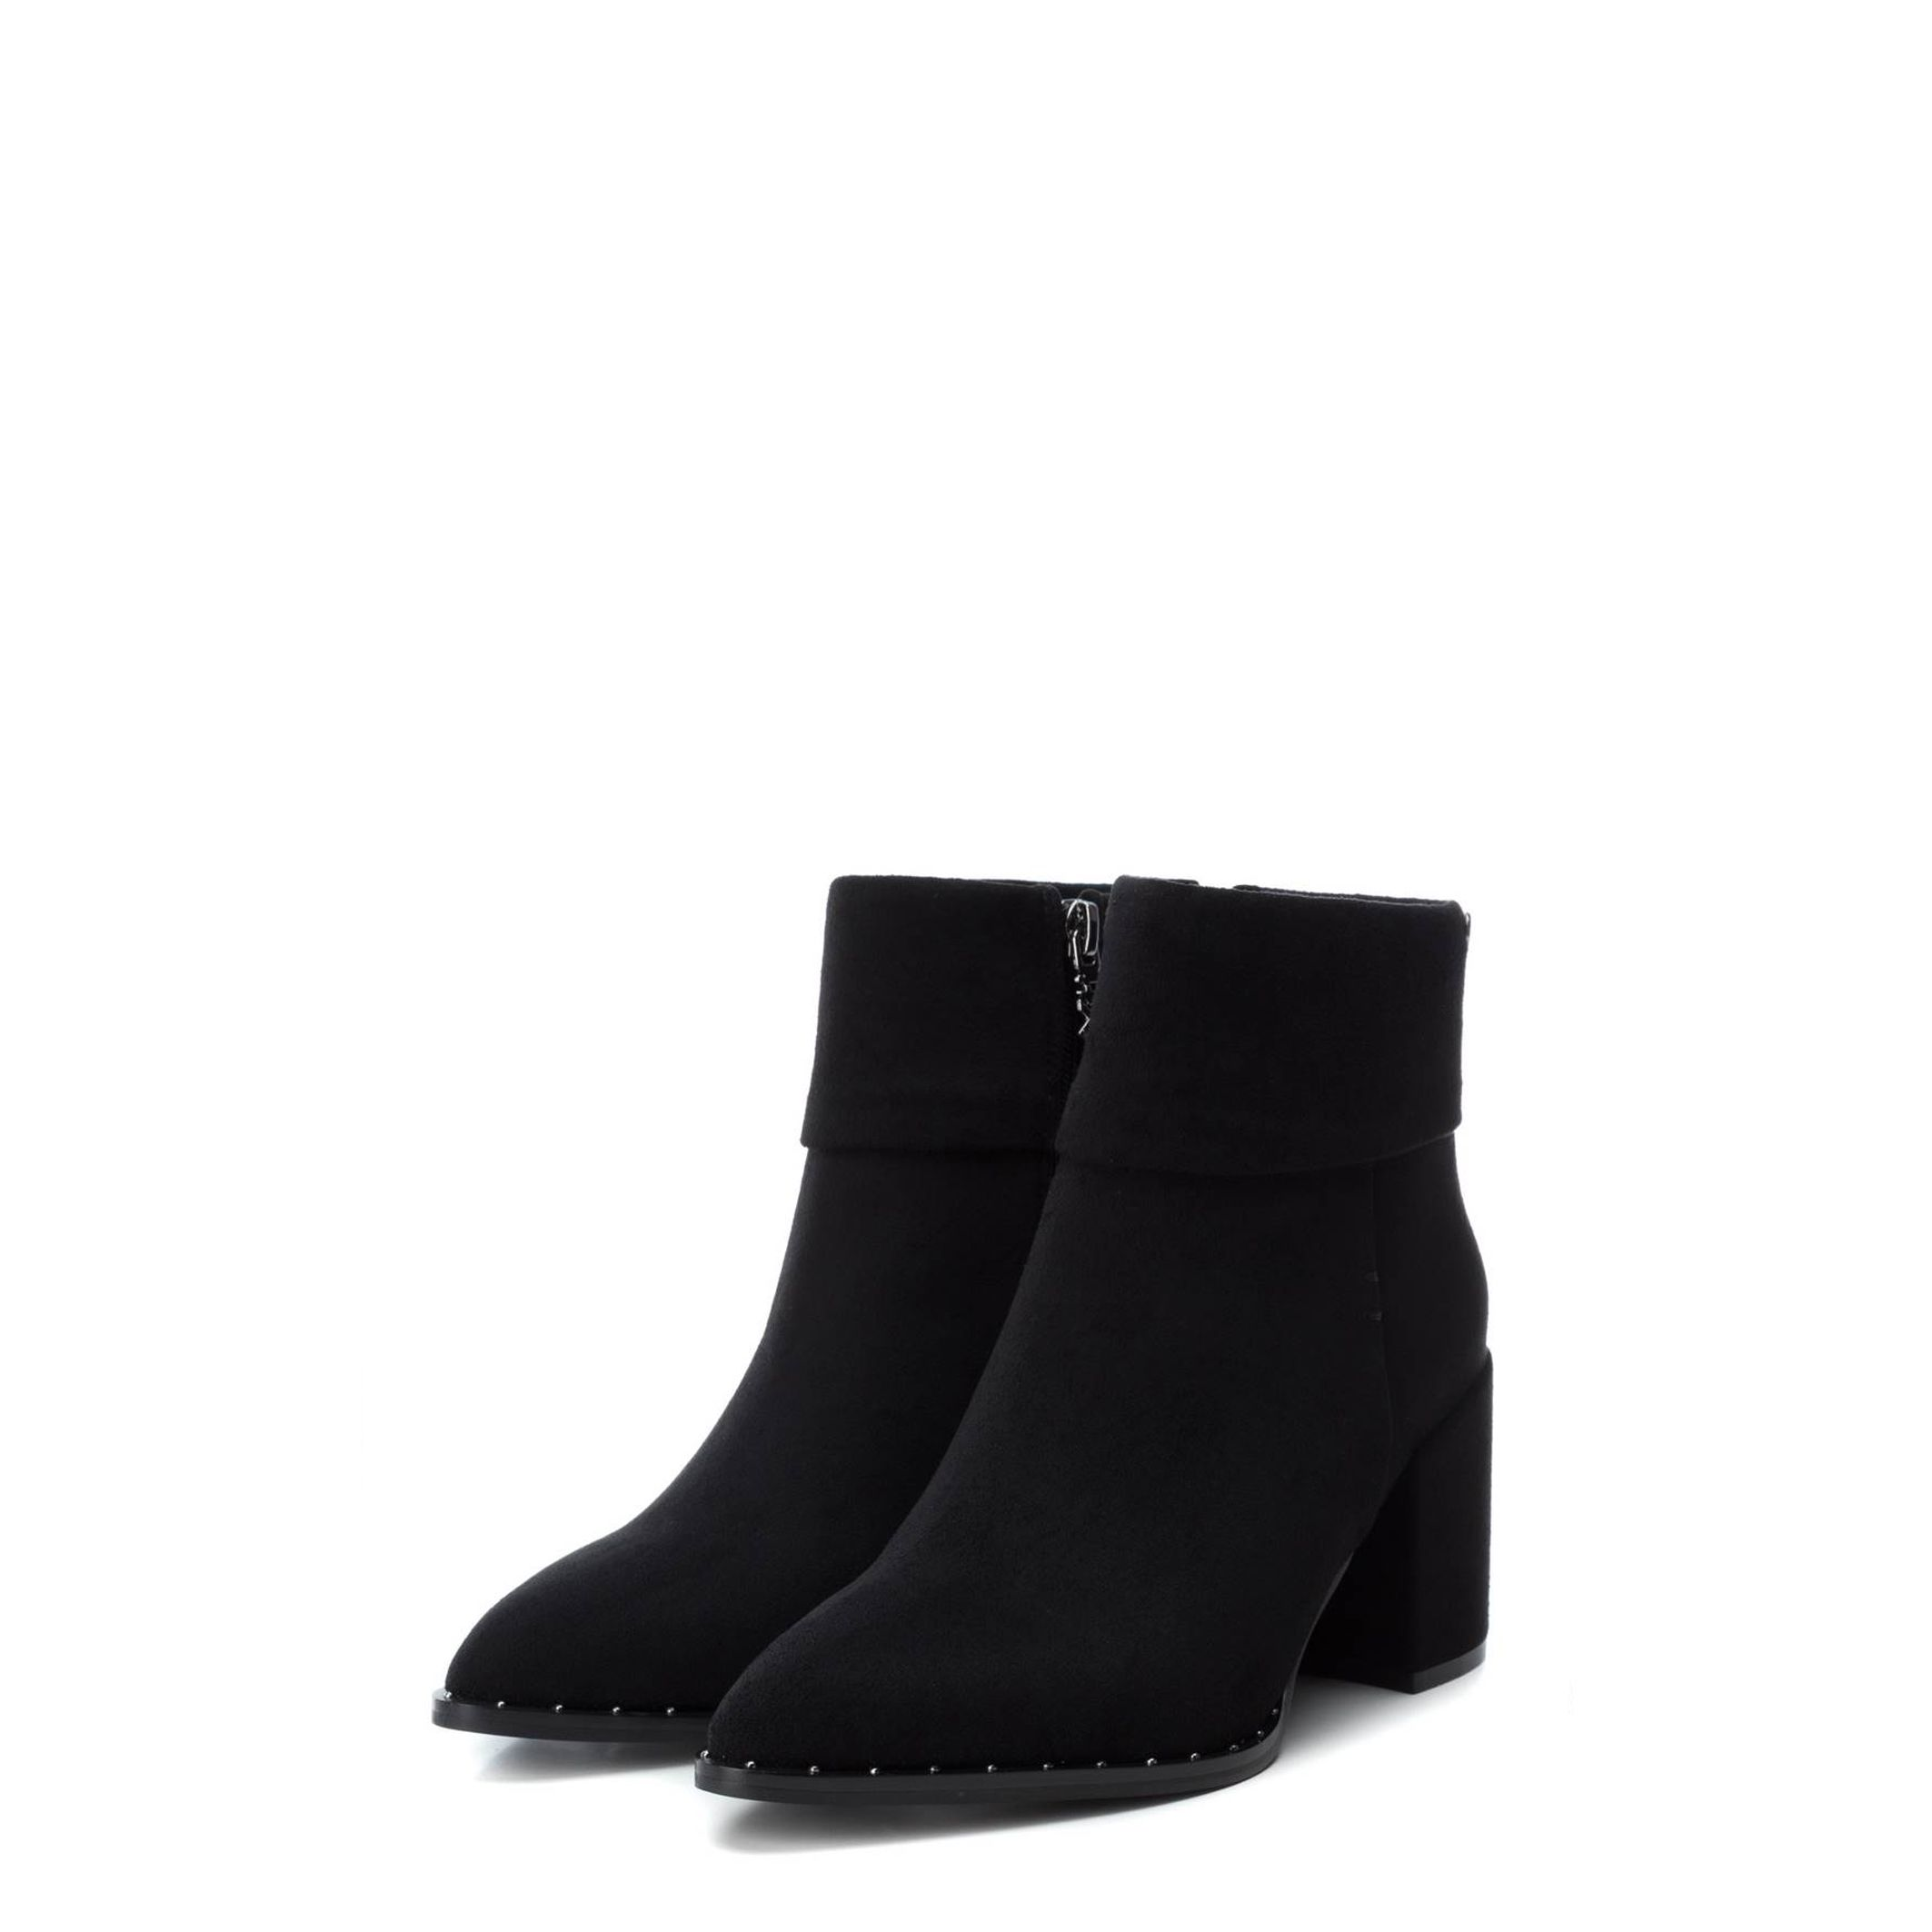 Schuhe Xti – 35118 – Schwarz